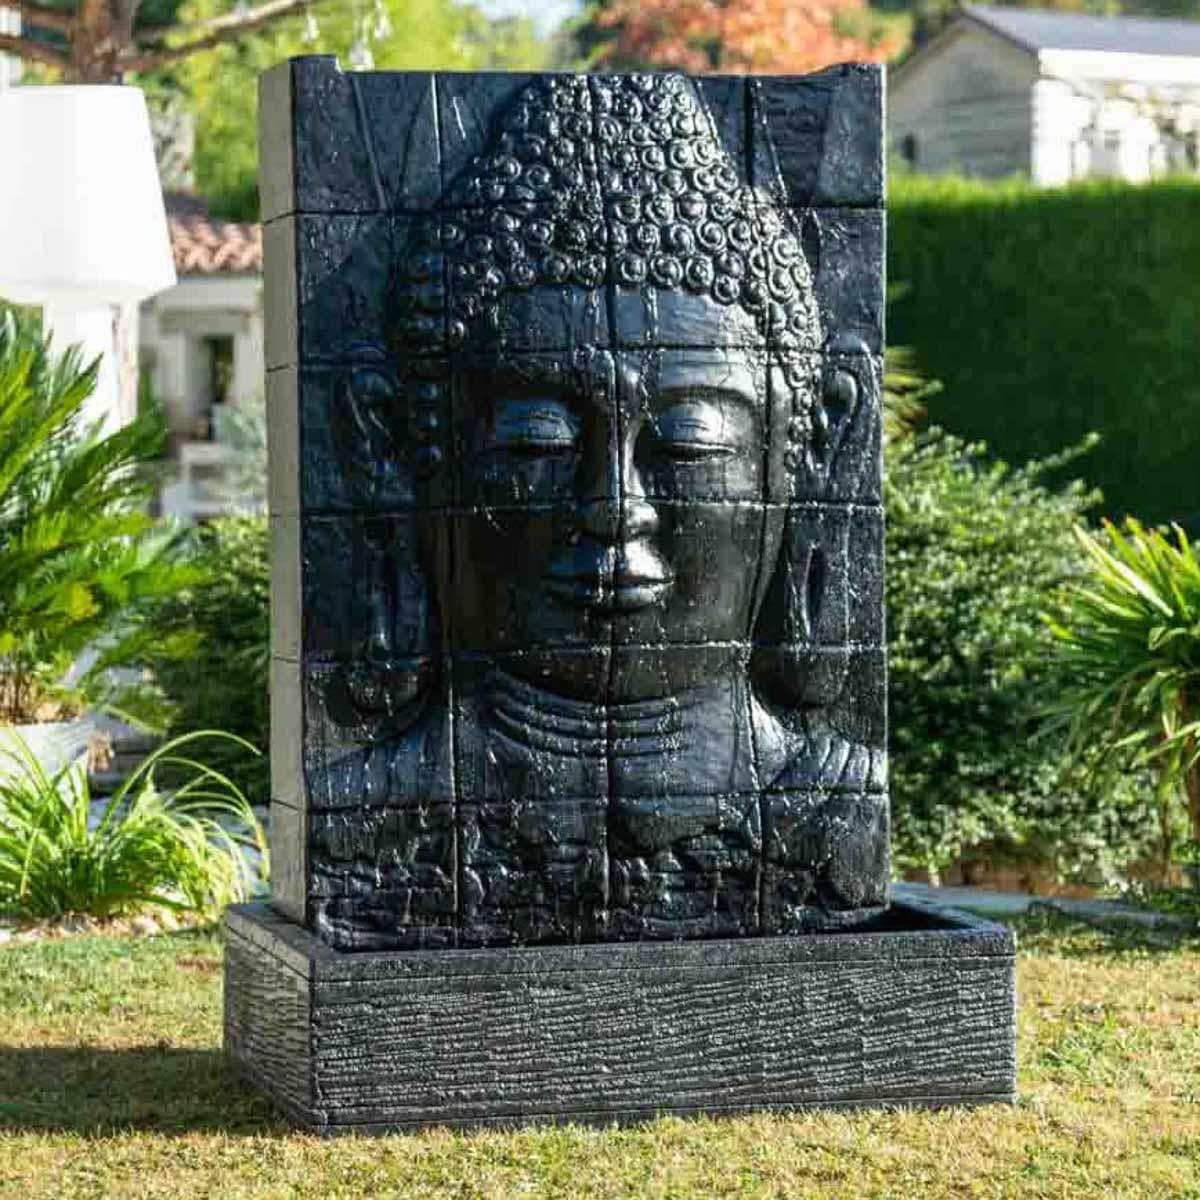 Pared de agua con estanque rostro de buda negro alto 1 50 m - Buda jardin ...